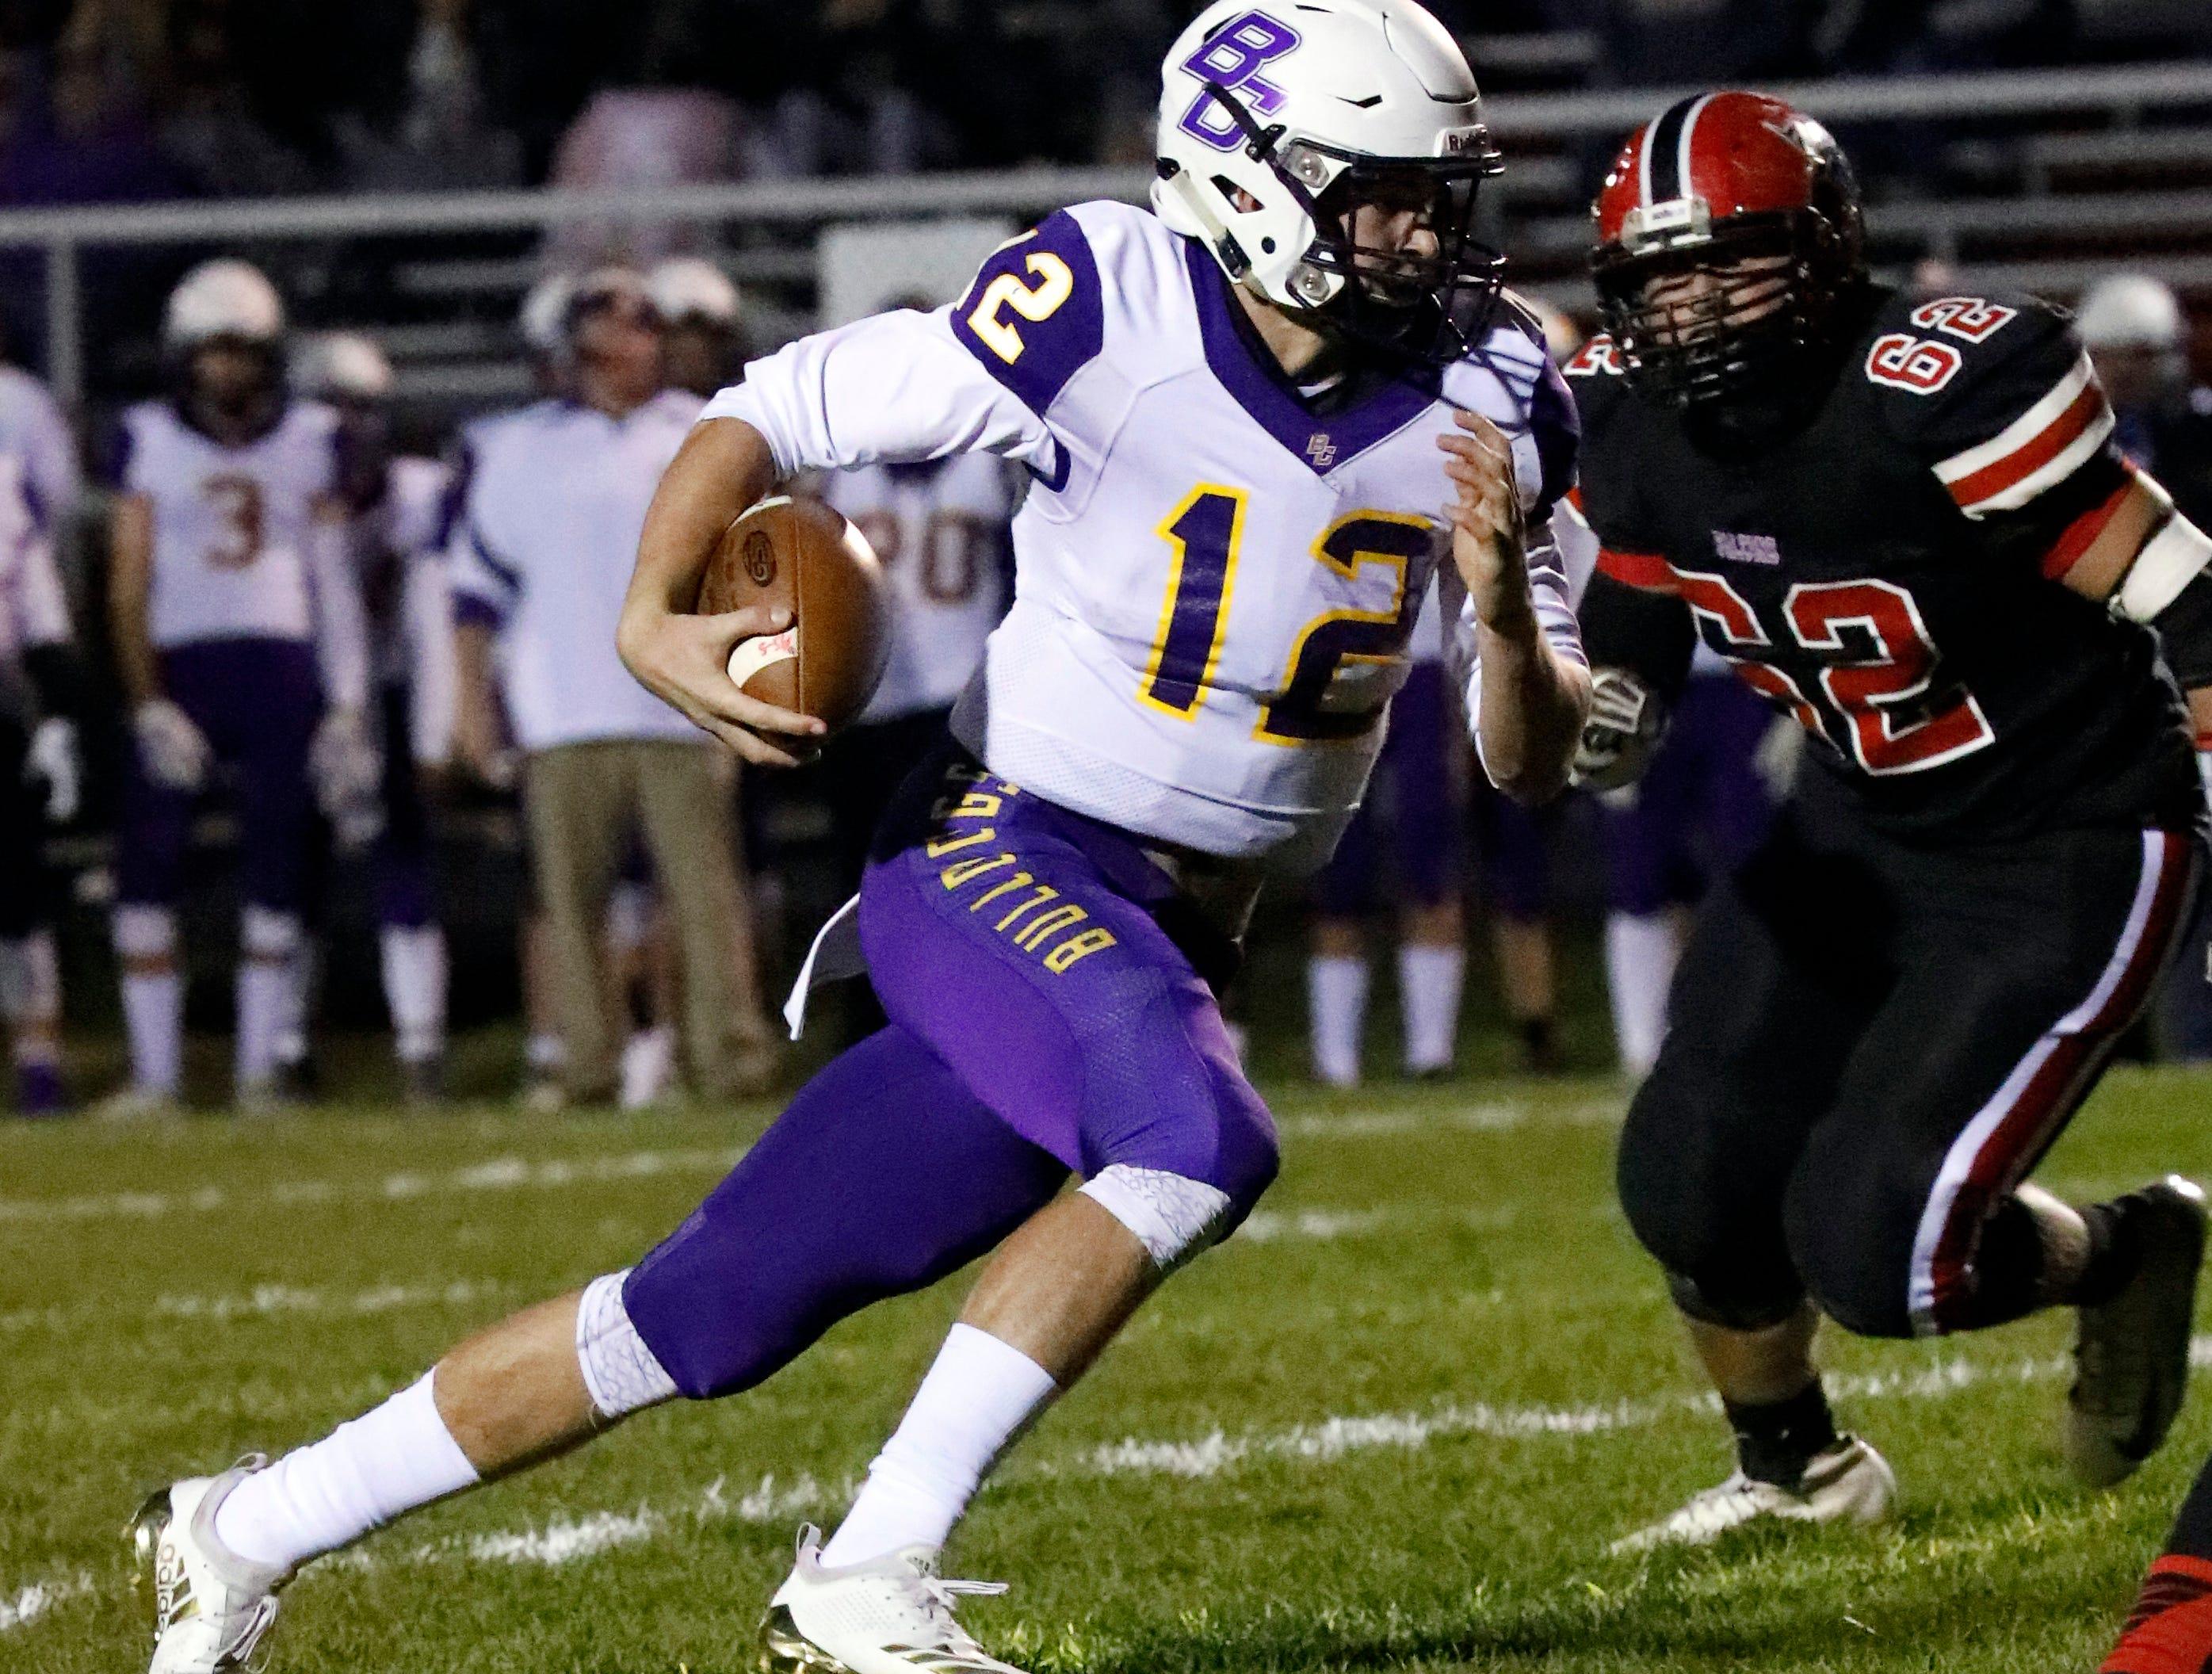 Bloom-Carroll's Otto Kuhns runs the ball Friday night, Oct. 19, 2018, at Fairfield Union High School in Rushville. The Bulldogs defeated Fairfield Union 44-7.